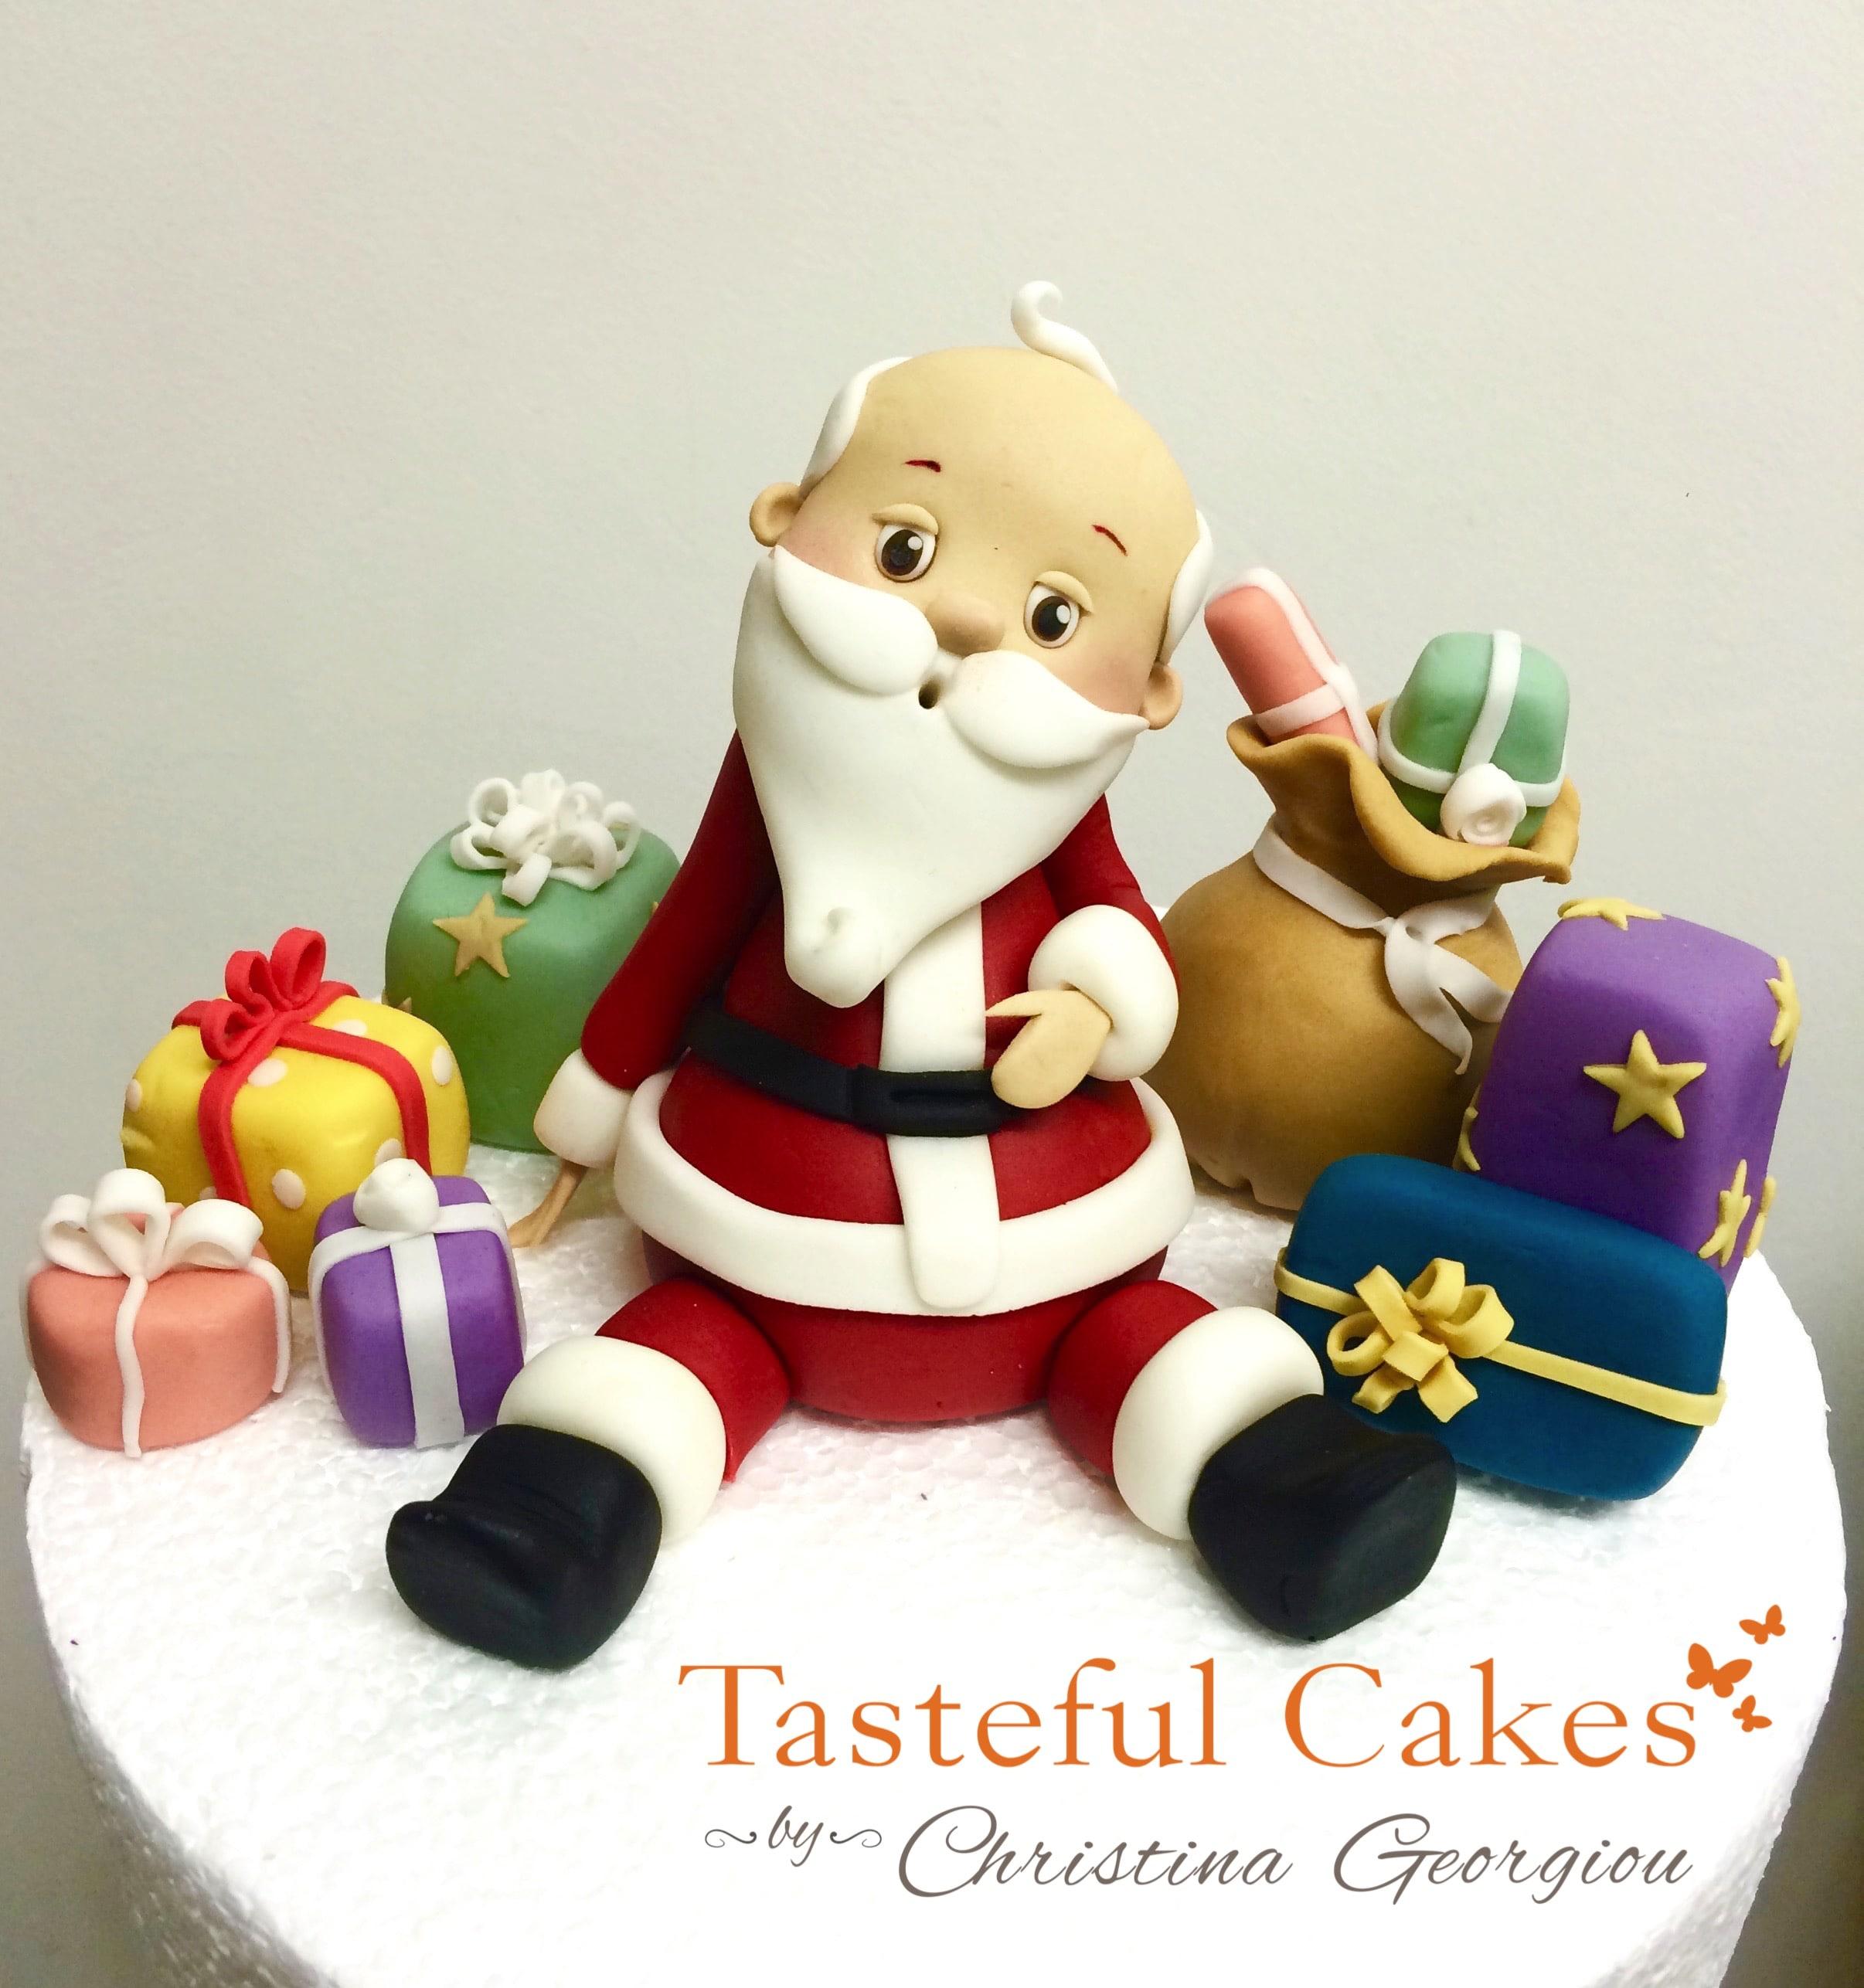 Professional Pastry And Cake Design School Pescara : Tasteful Cakes By Christina Georgiou Tasteful Cakes ...